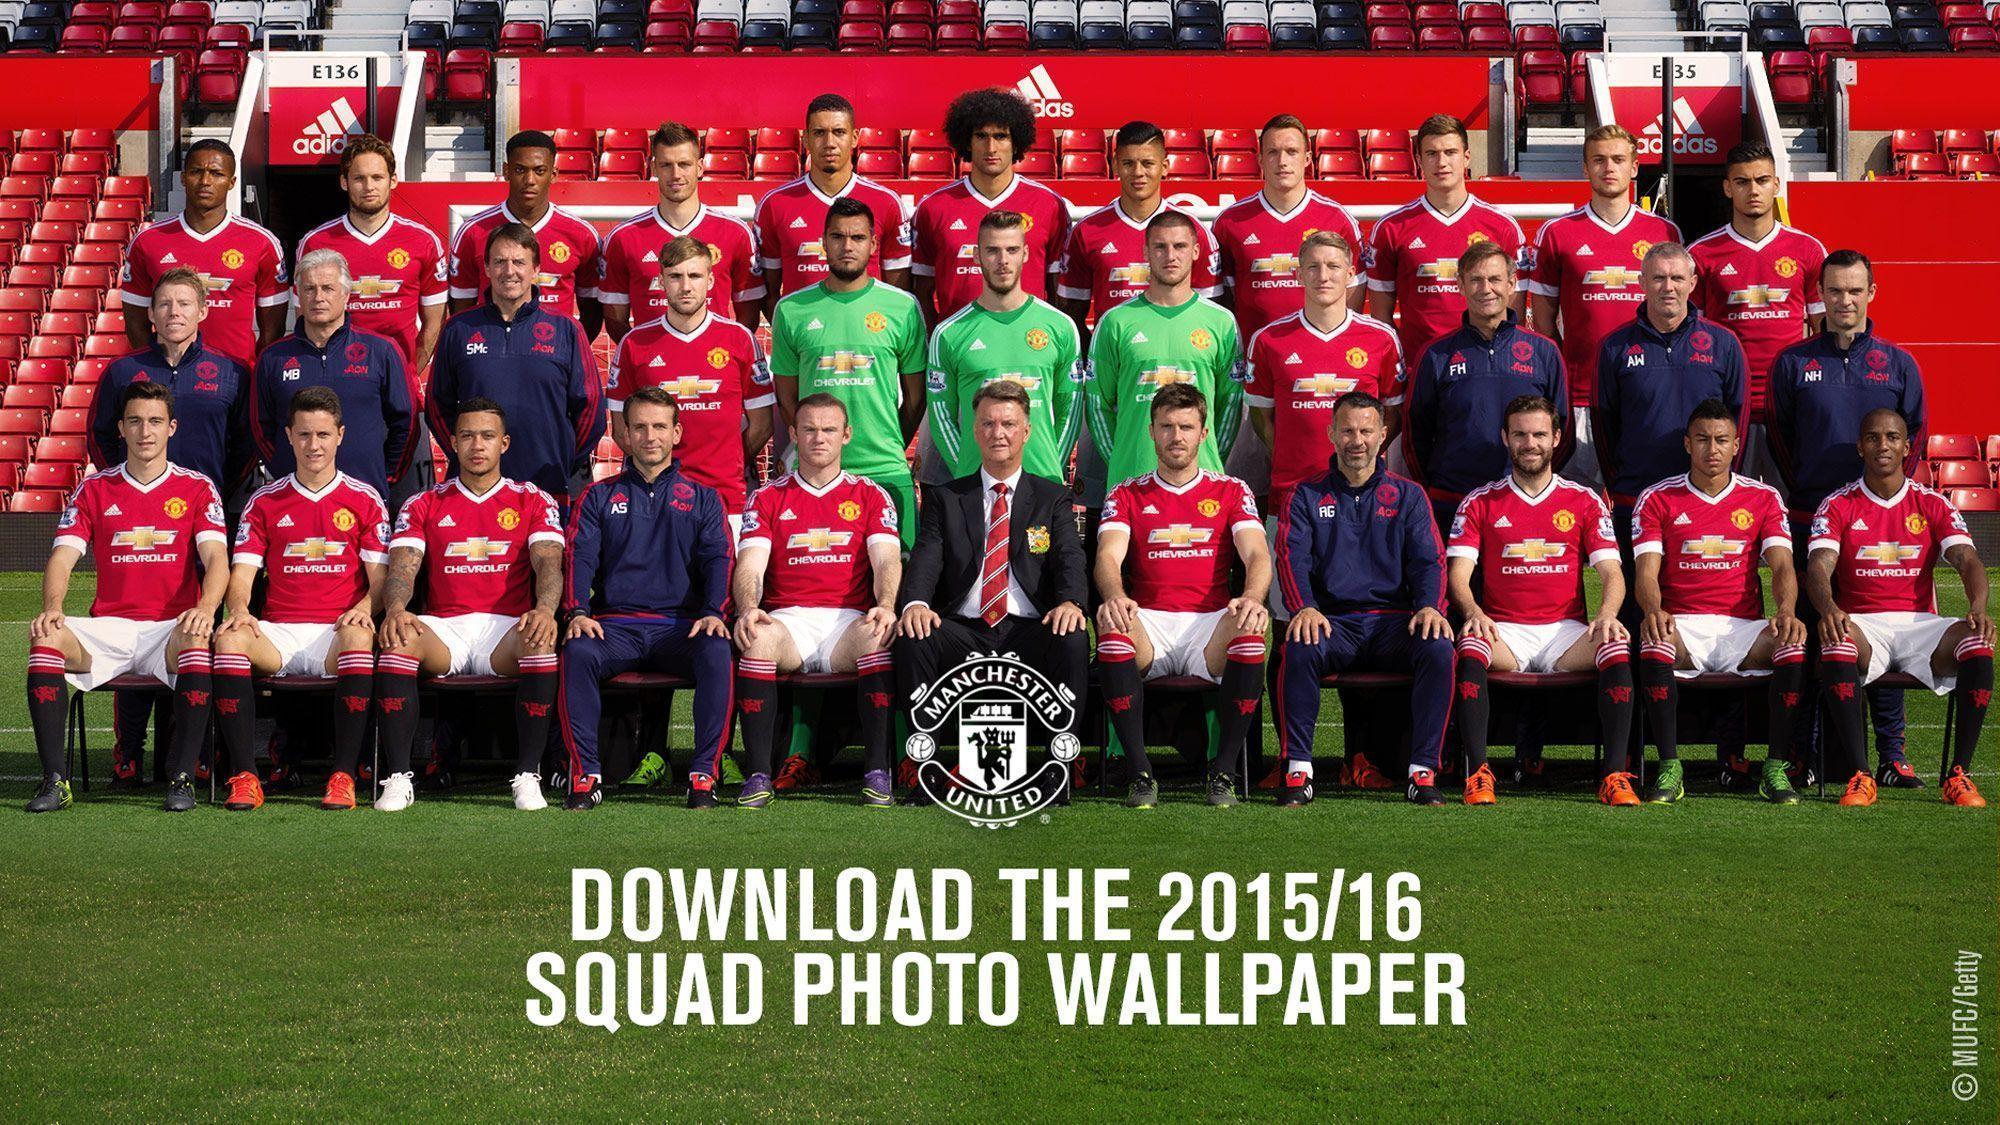 Man u wallpaper 2016 free